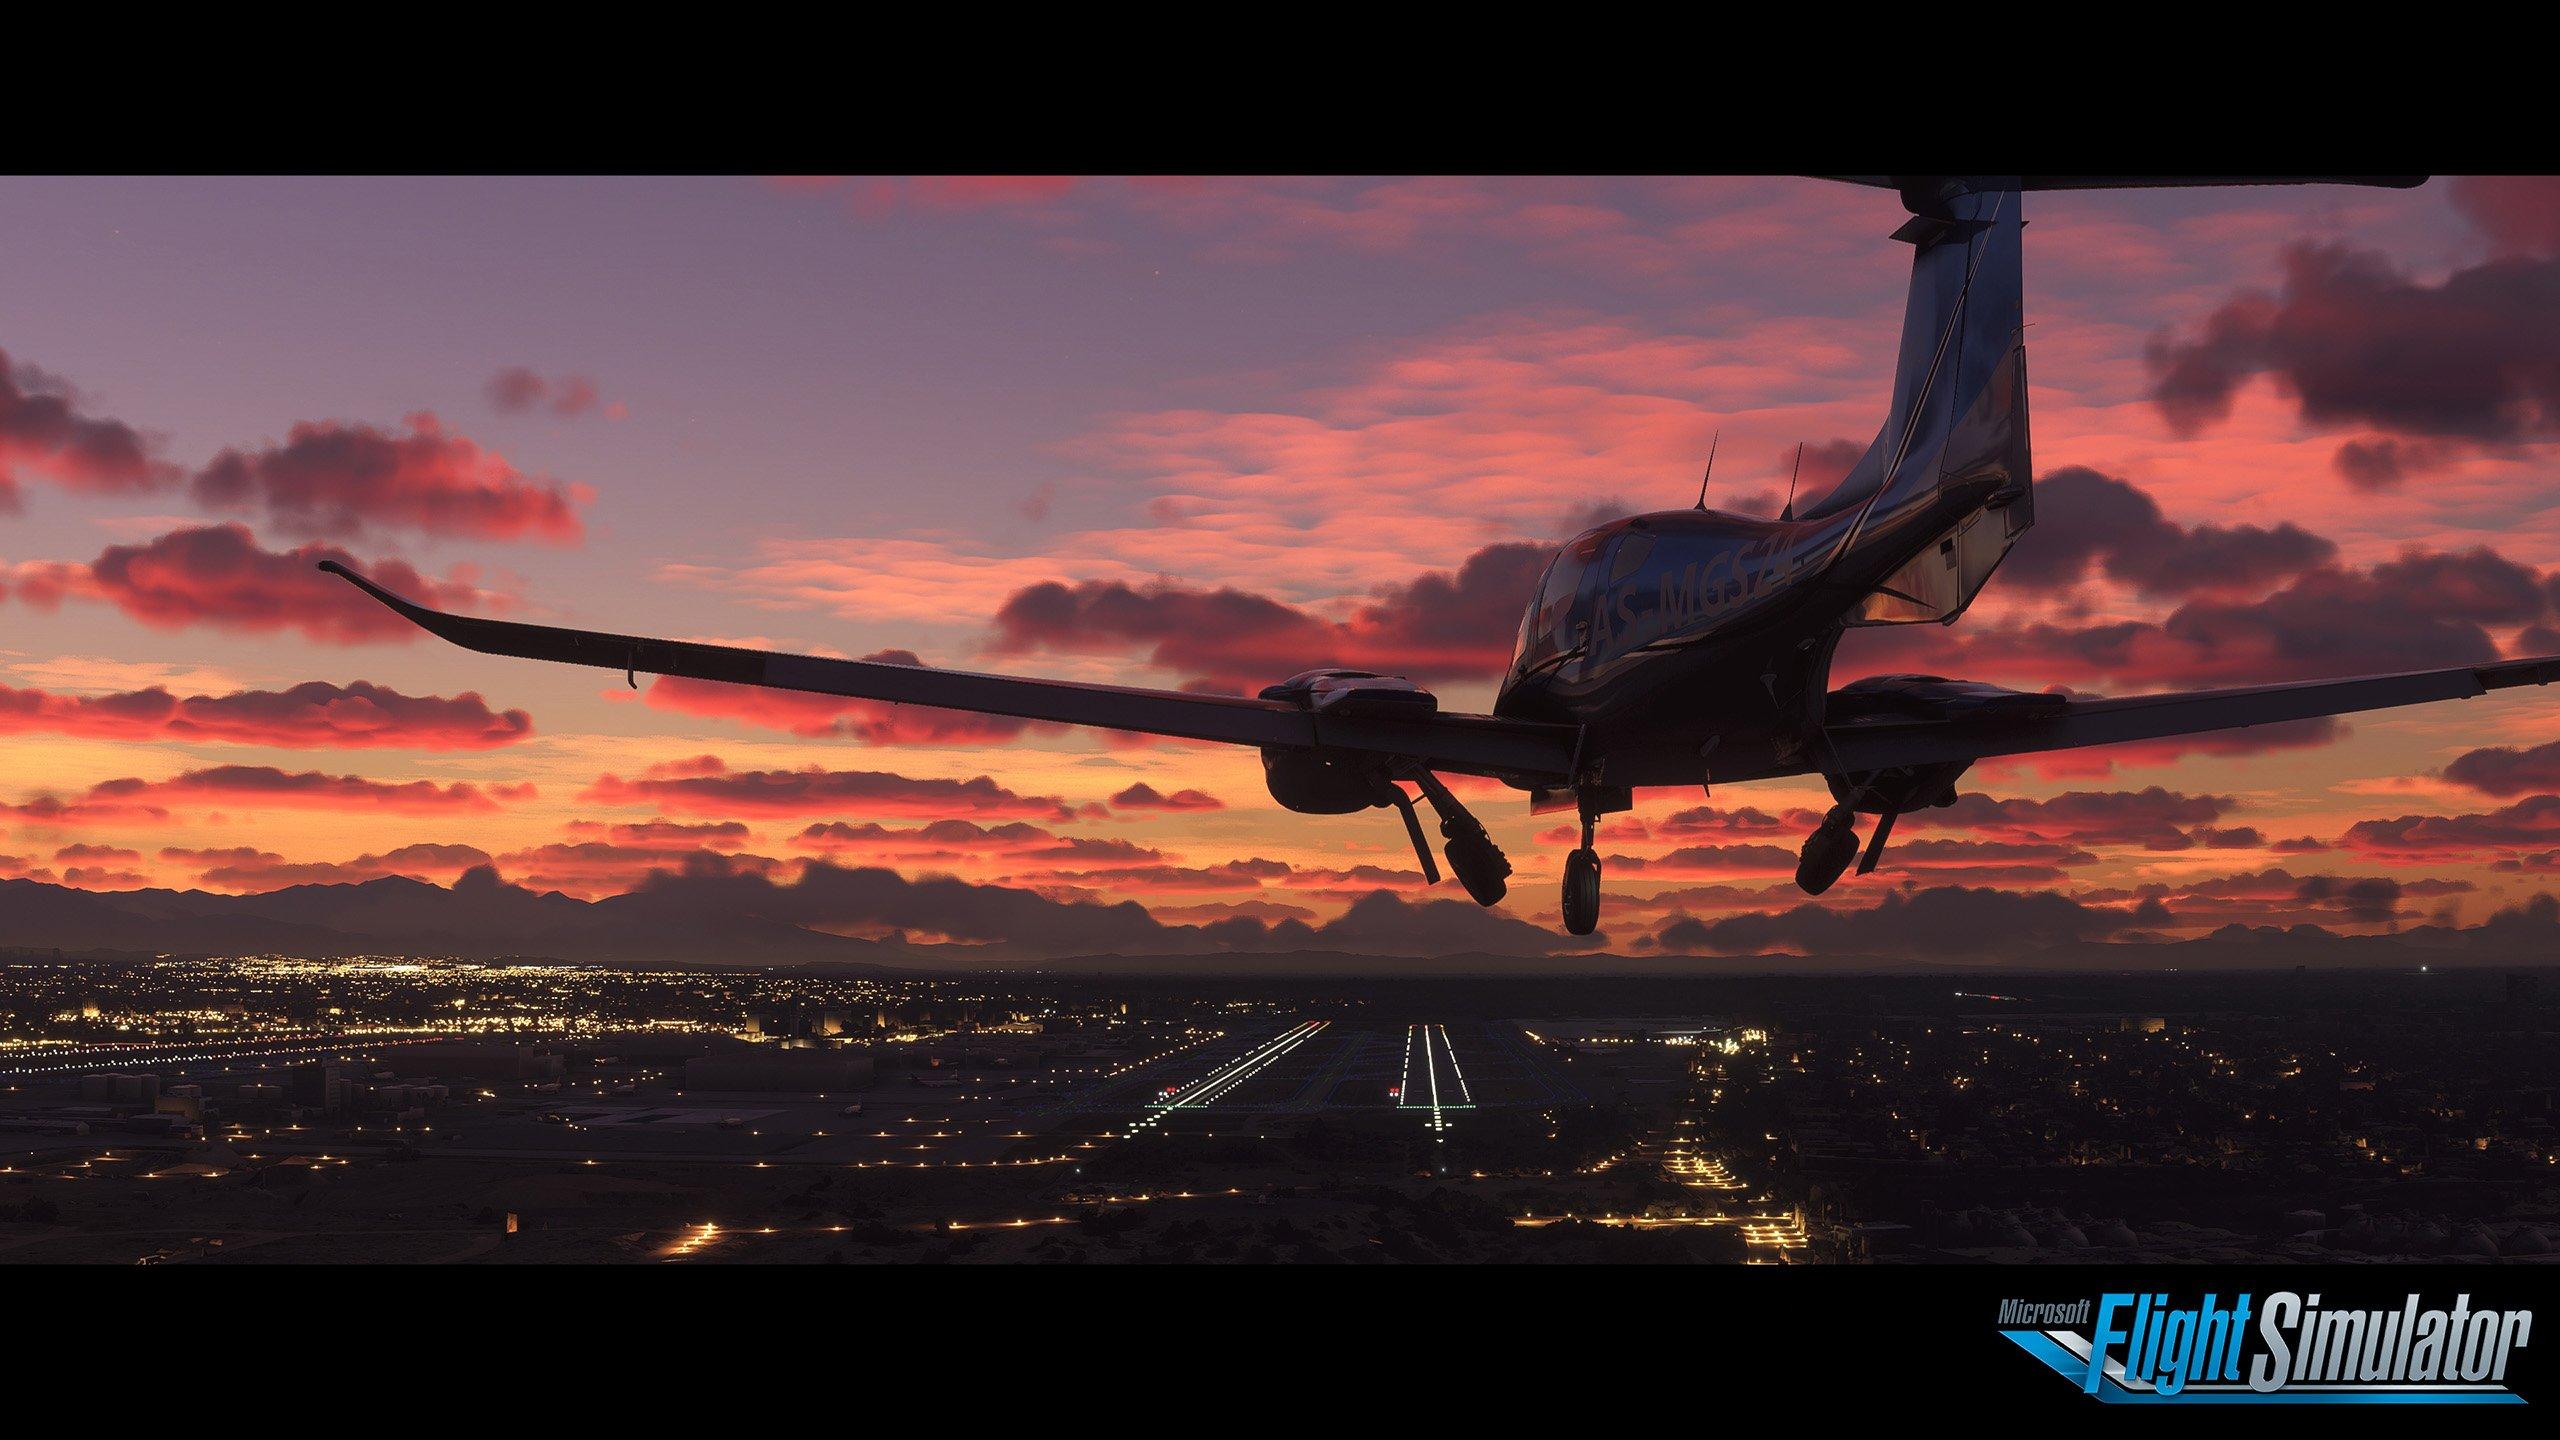 Microsoft Flight Simulator Release Date